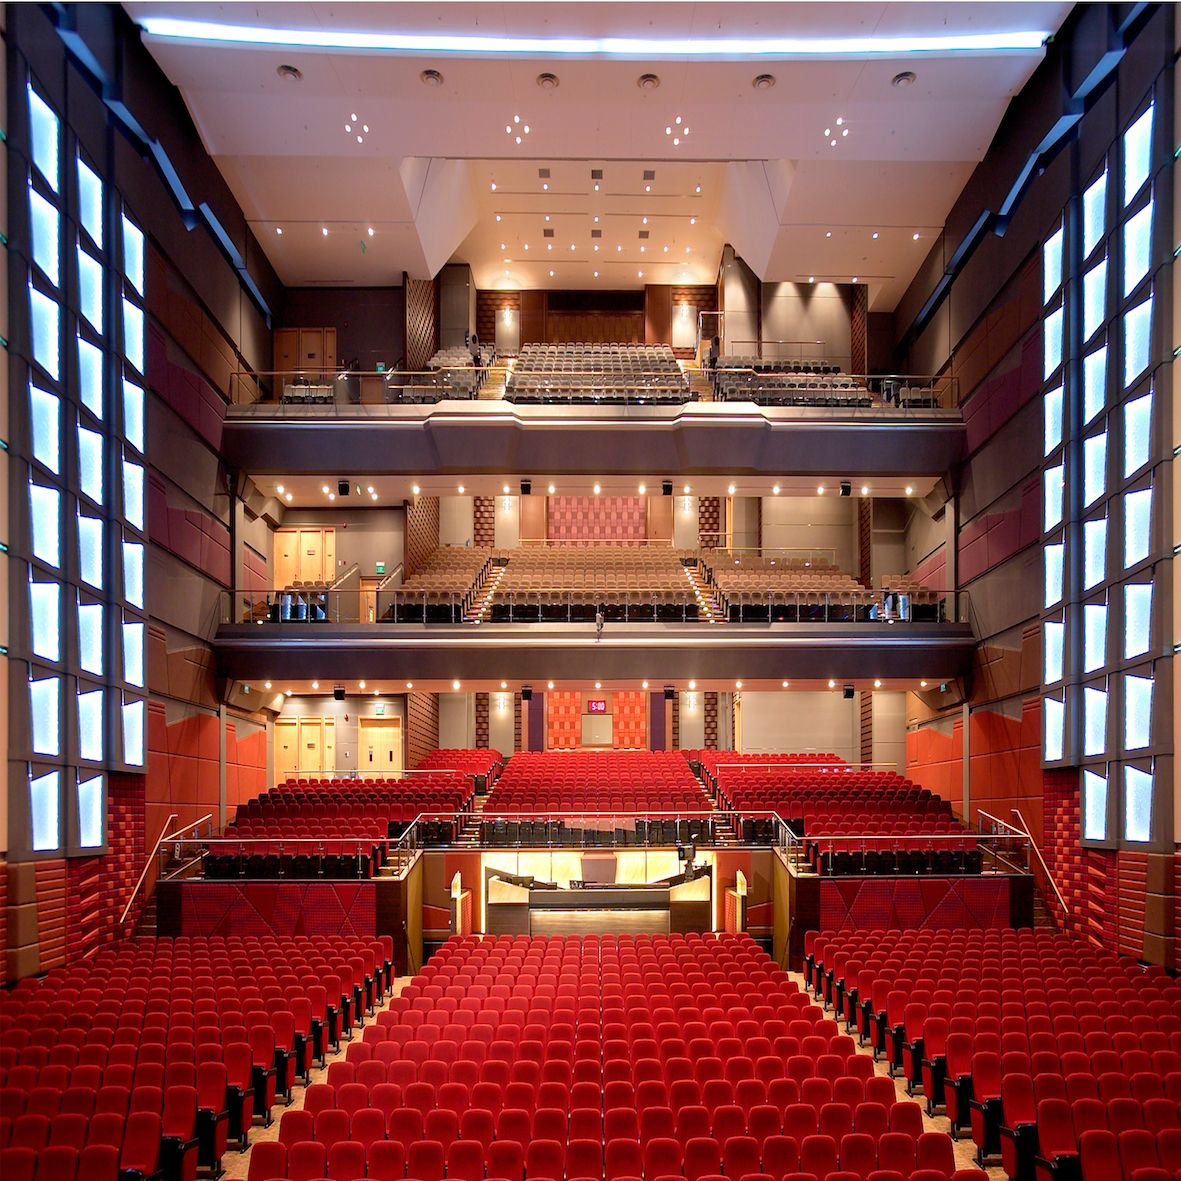 www iida-intl com#Auditorium Sounds Visual designs